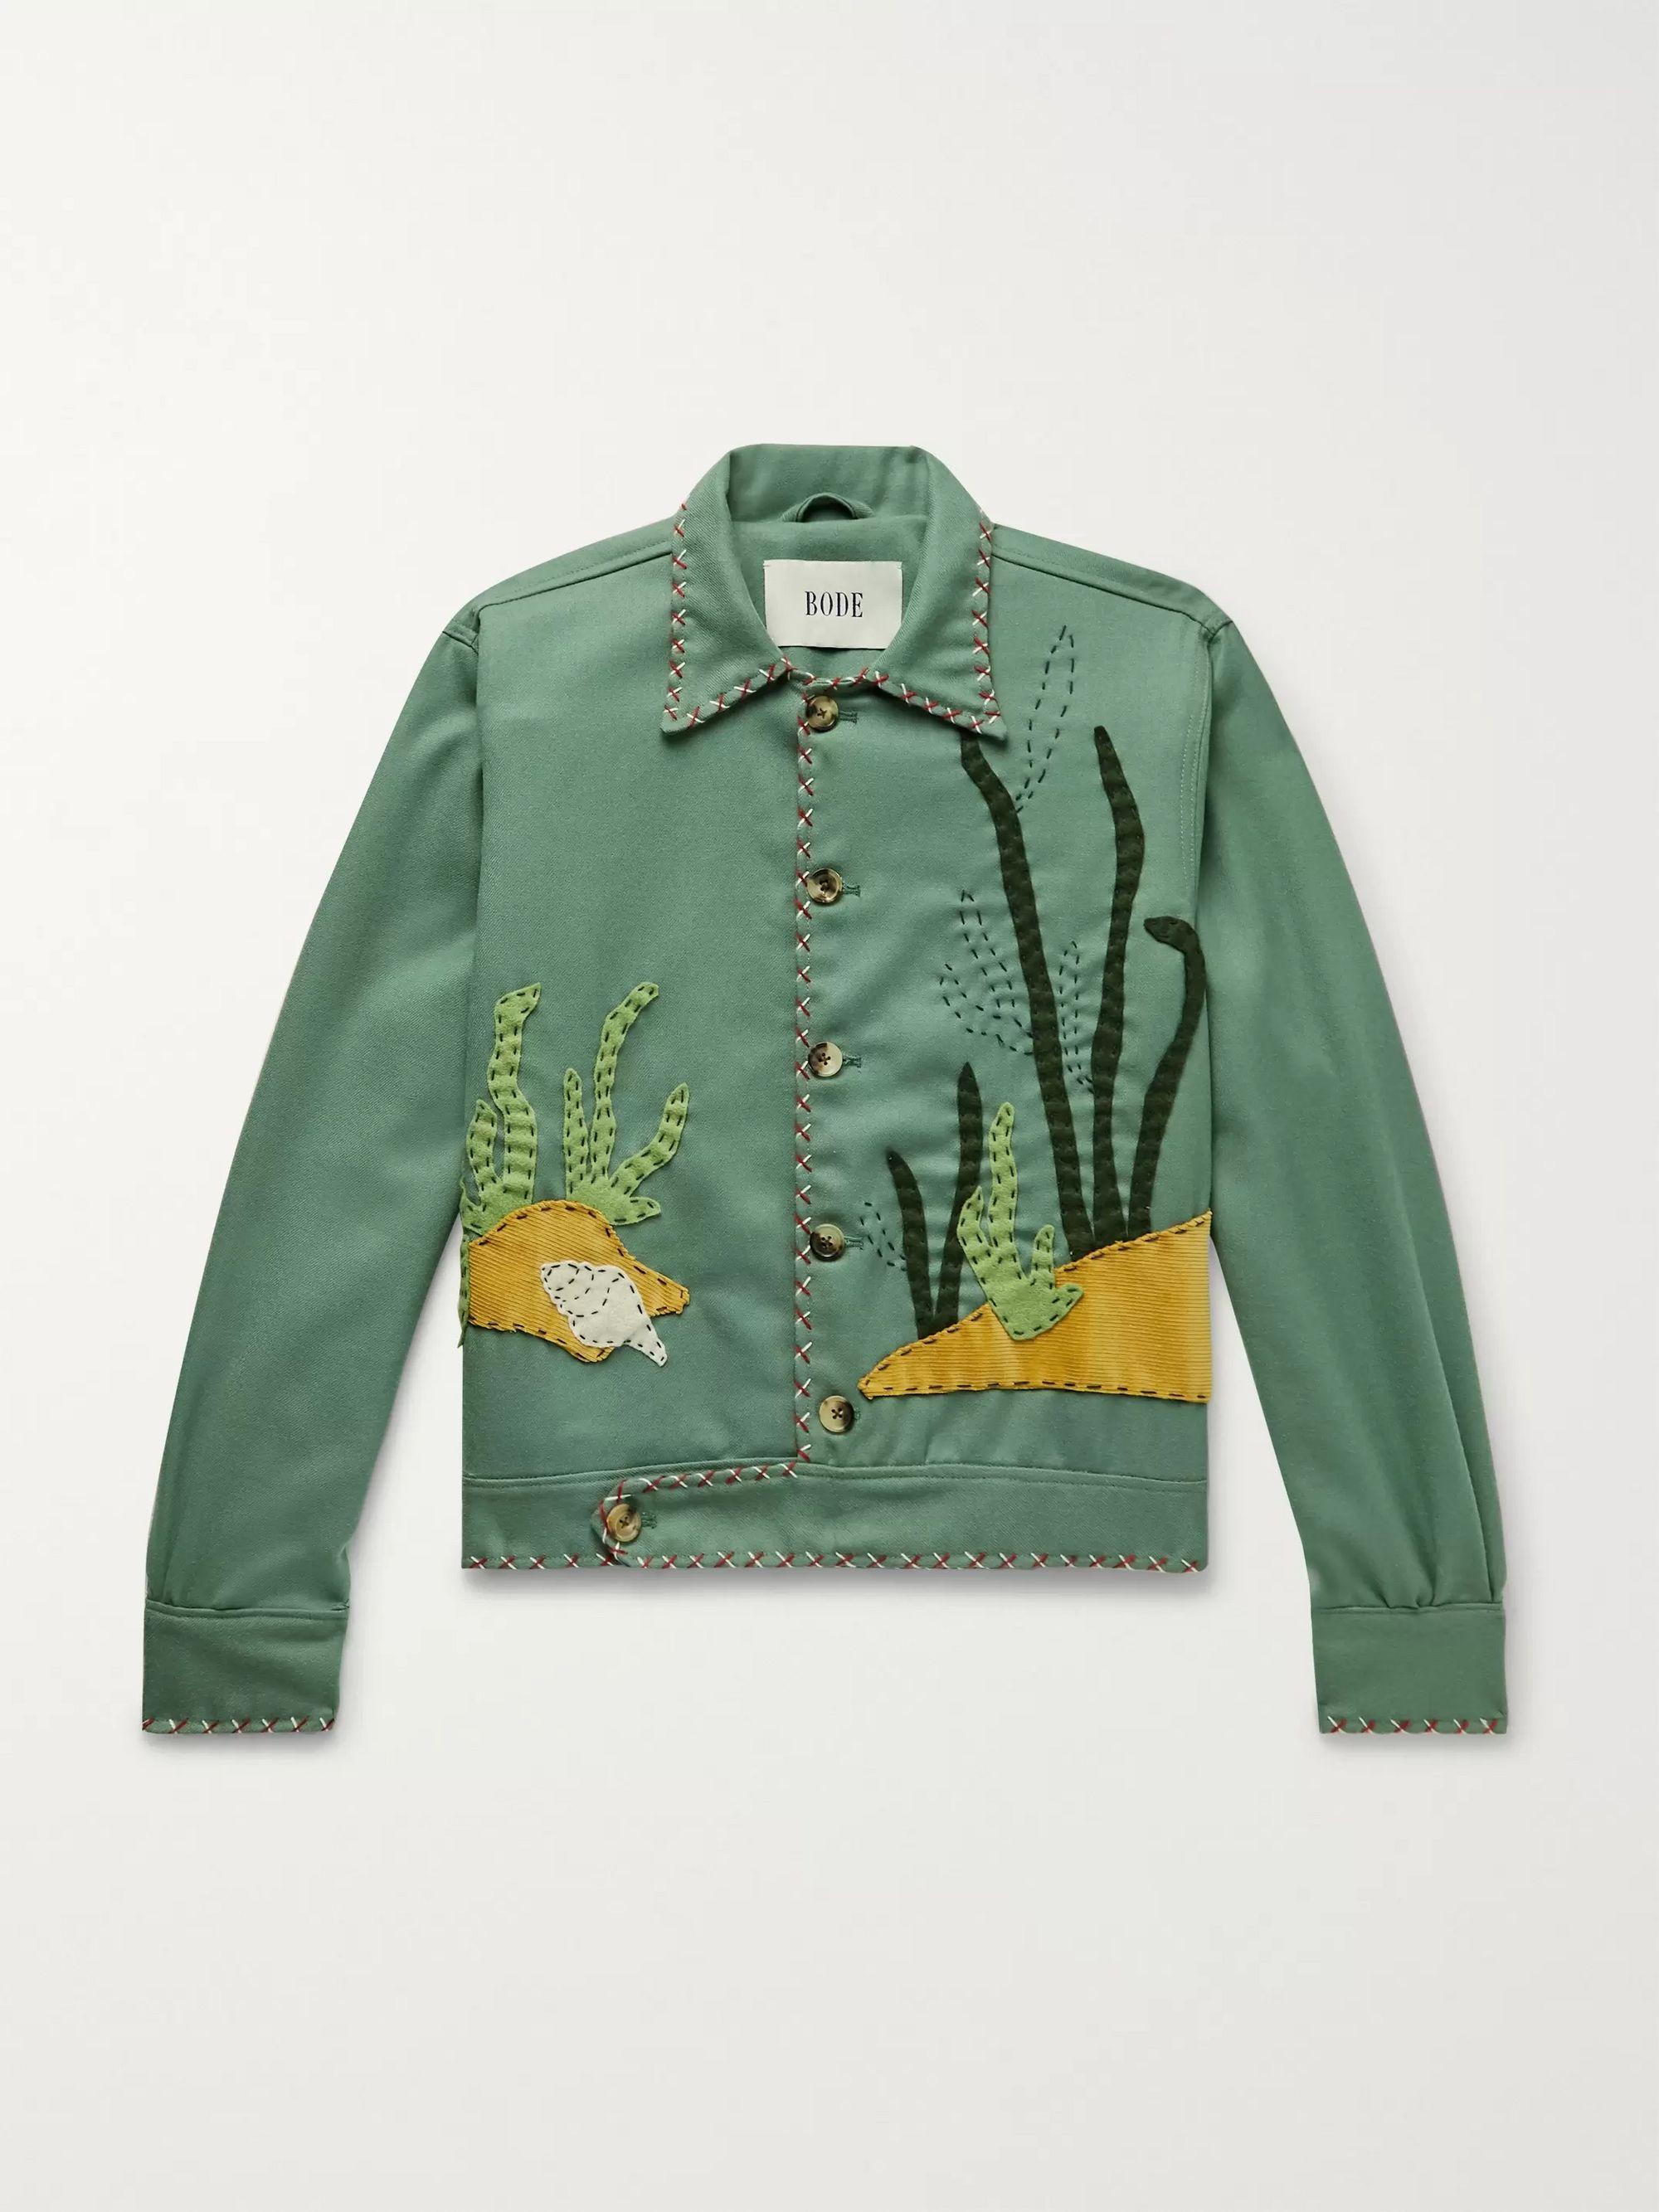 Appliquéd Wool Twill Jacket by Bode